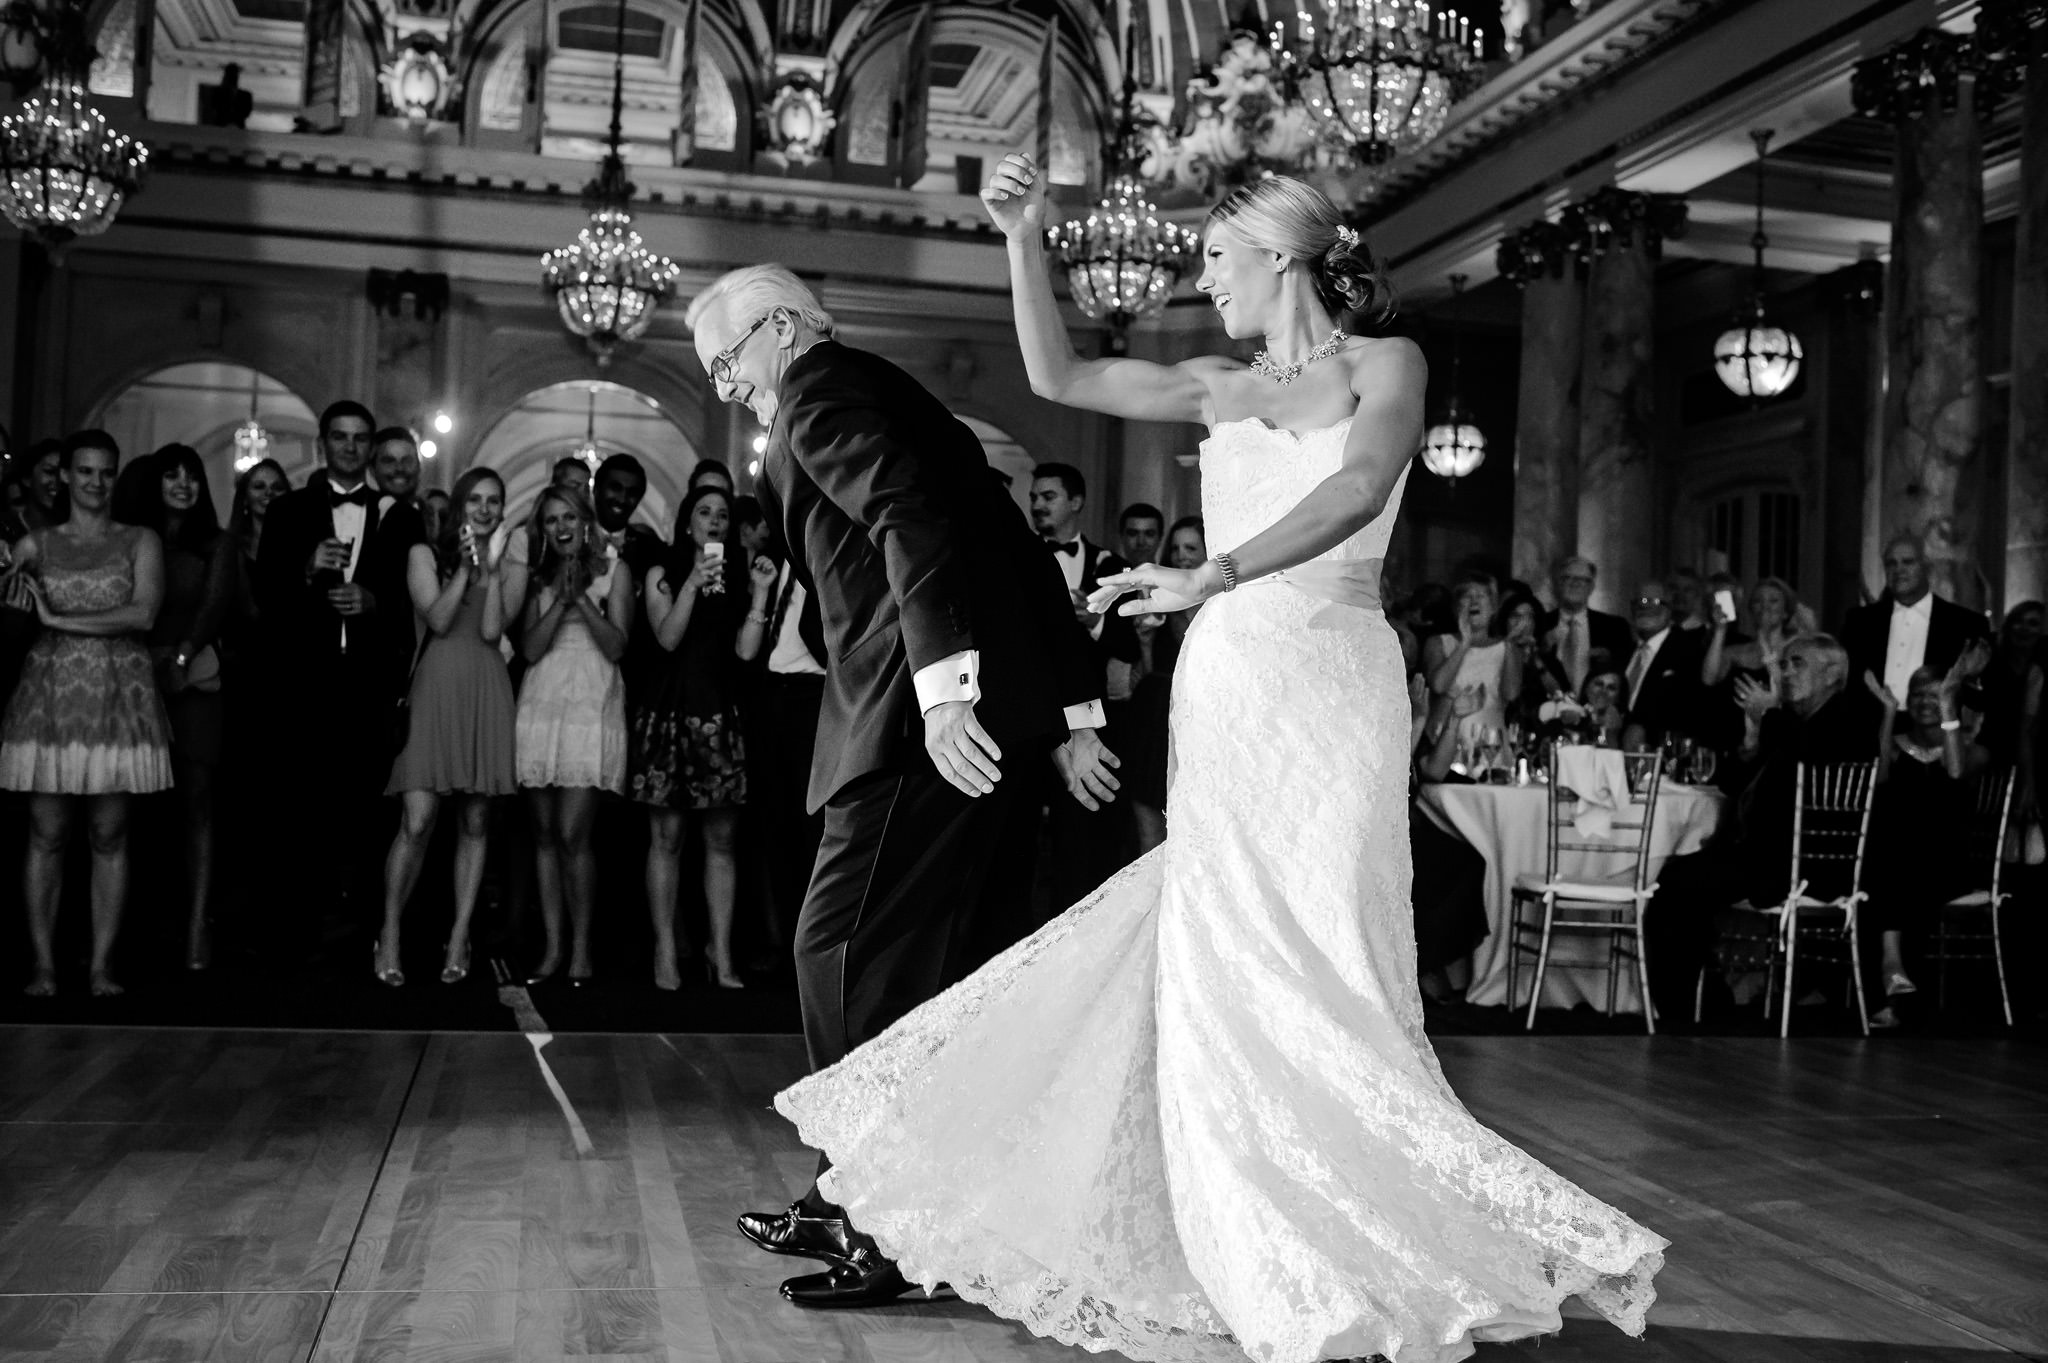 25-20140913-ShannonDan-Spradling-wed